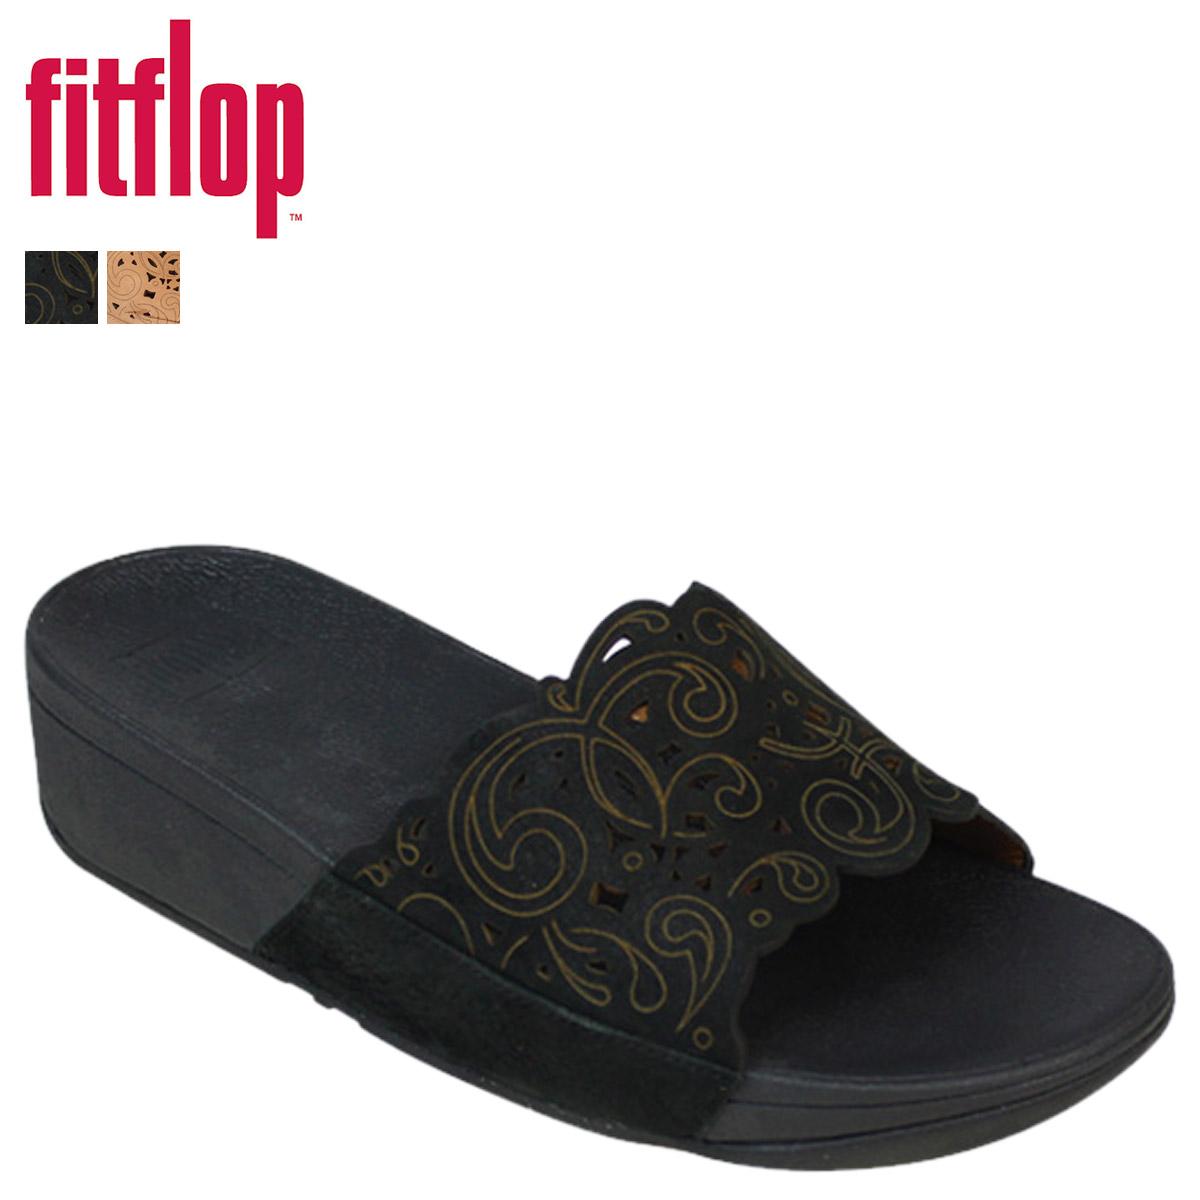 35b07603c8de Fitflop Flora Price Philippines - Avanti Court Primary School